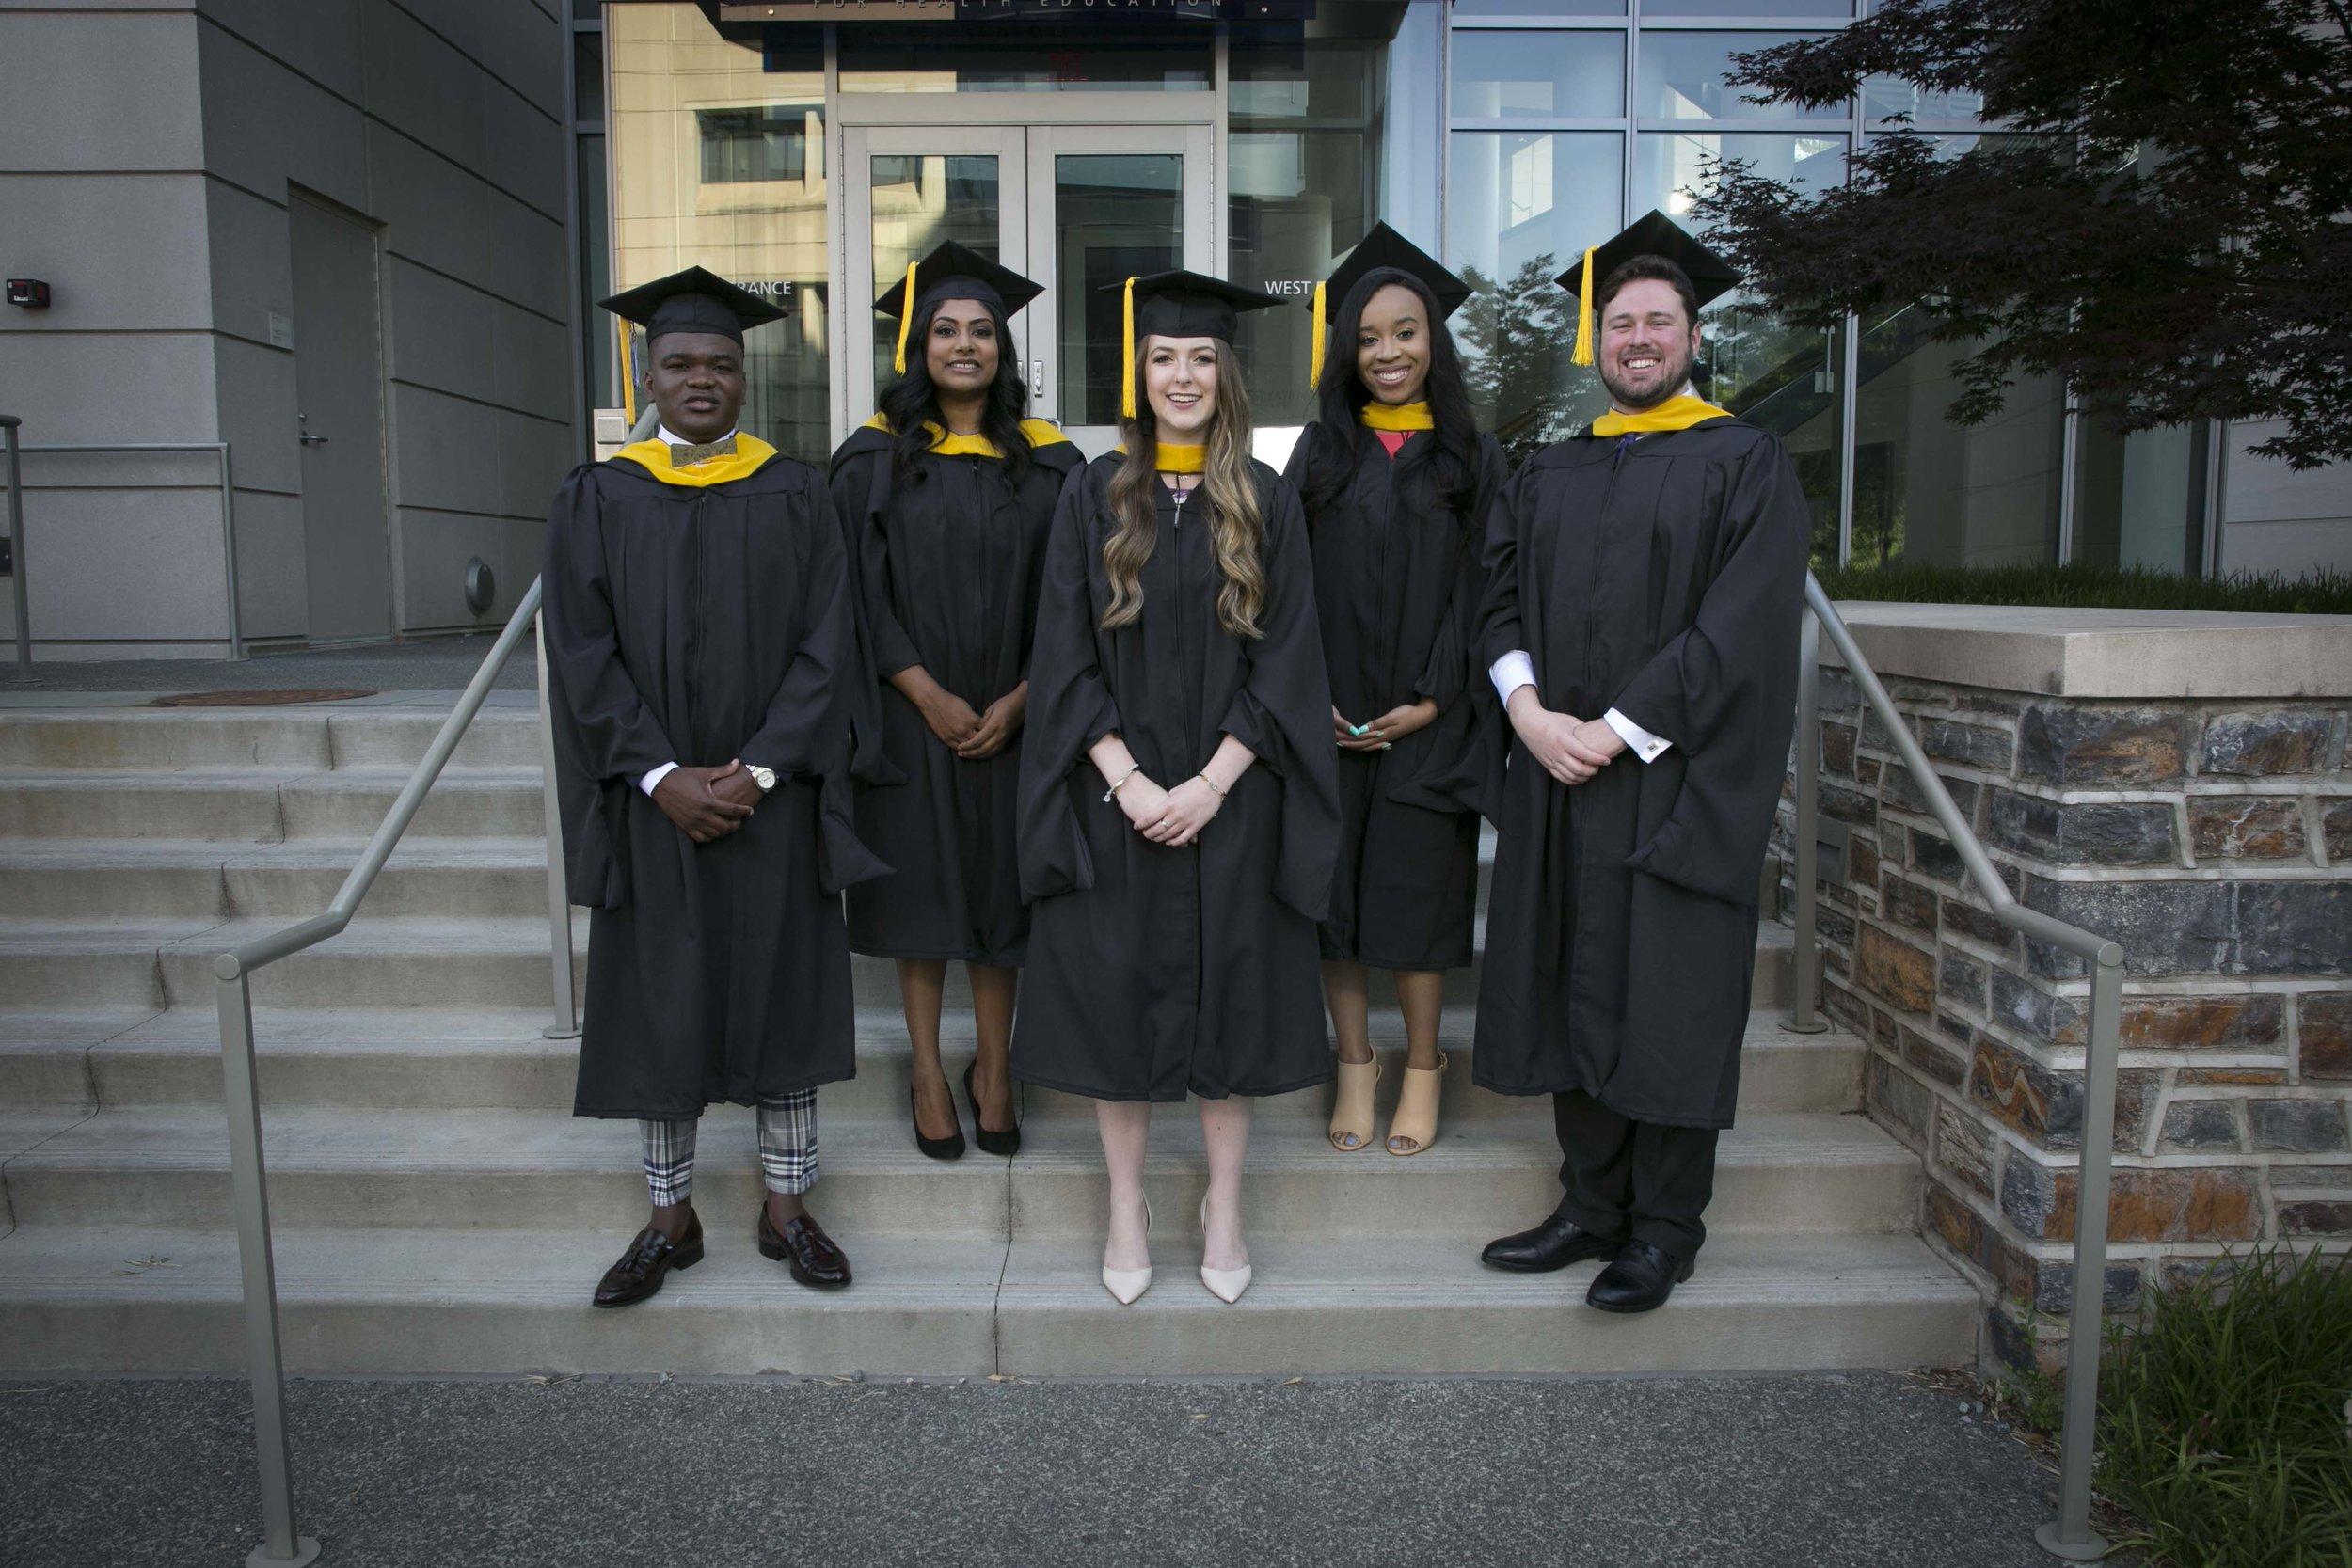 051218_mbs_graduation019.JPG